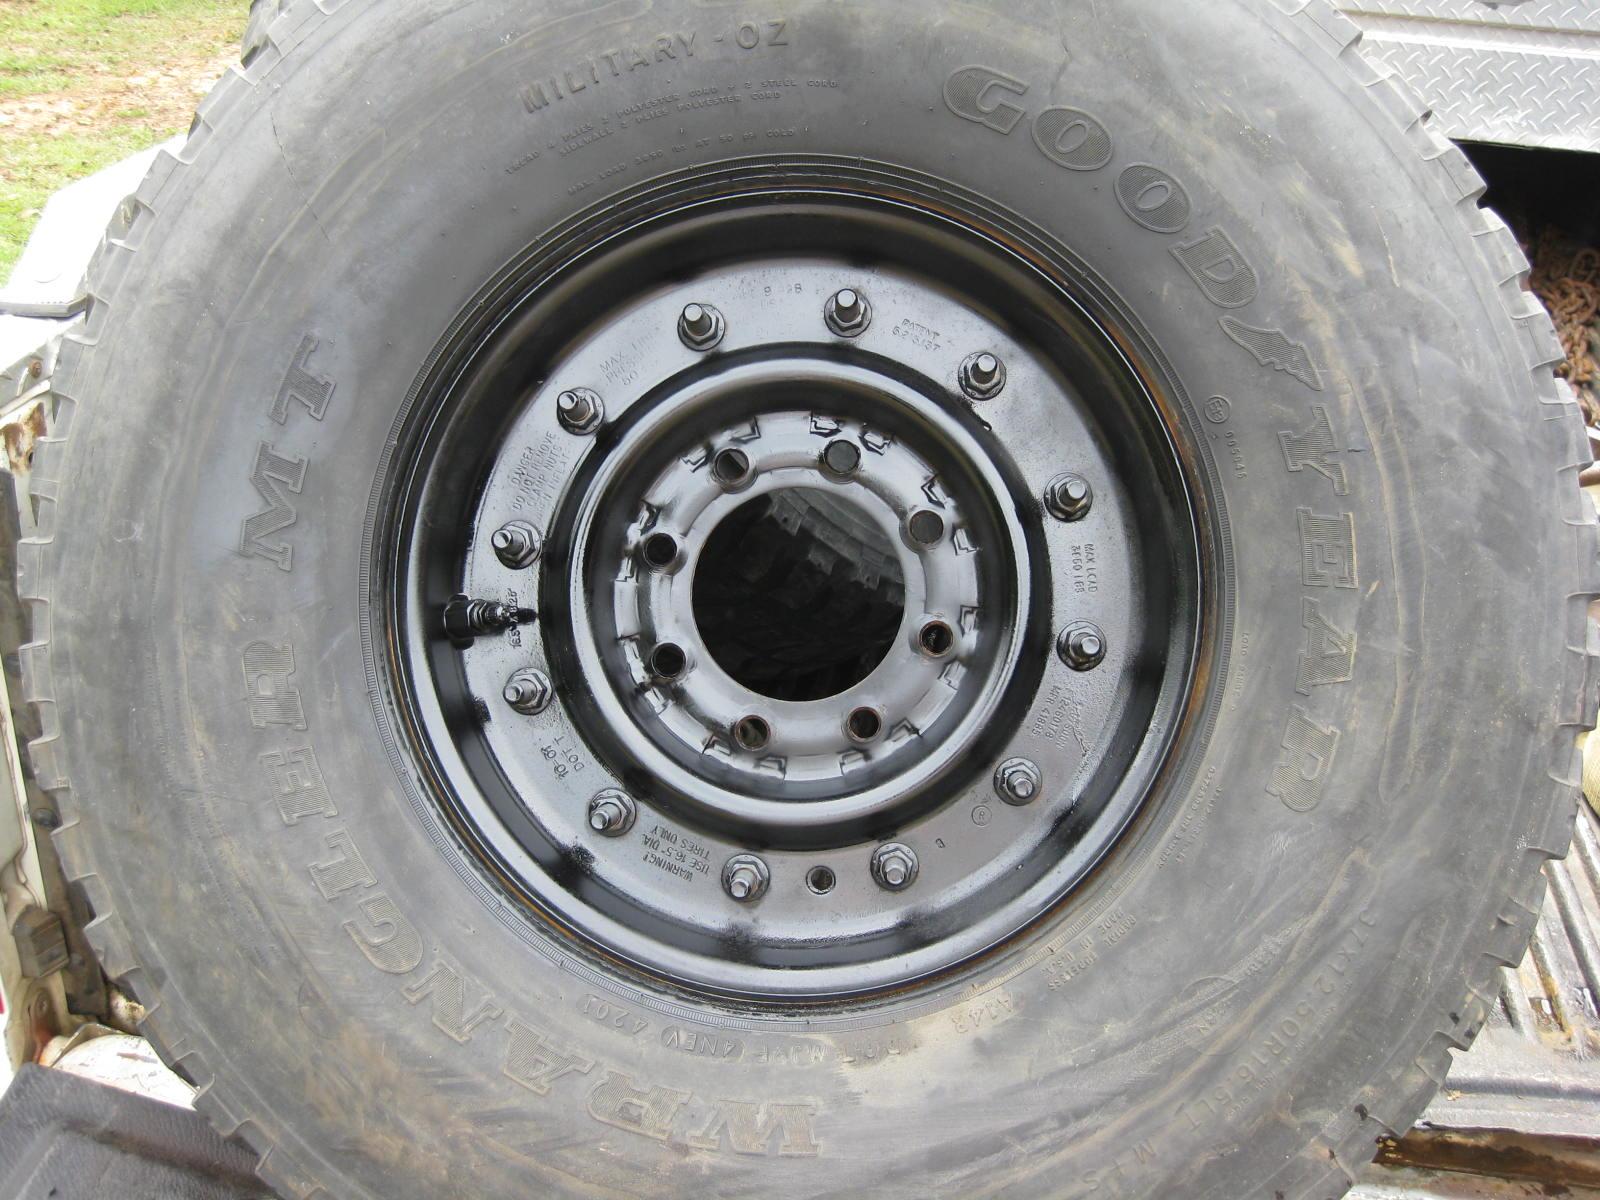 "FS 5 H1 Hummer 8 Lug Wheels 37"" Tires 37x12 50x16 5 $800"